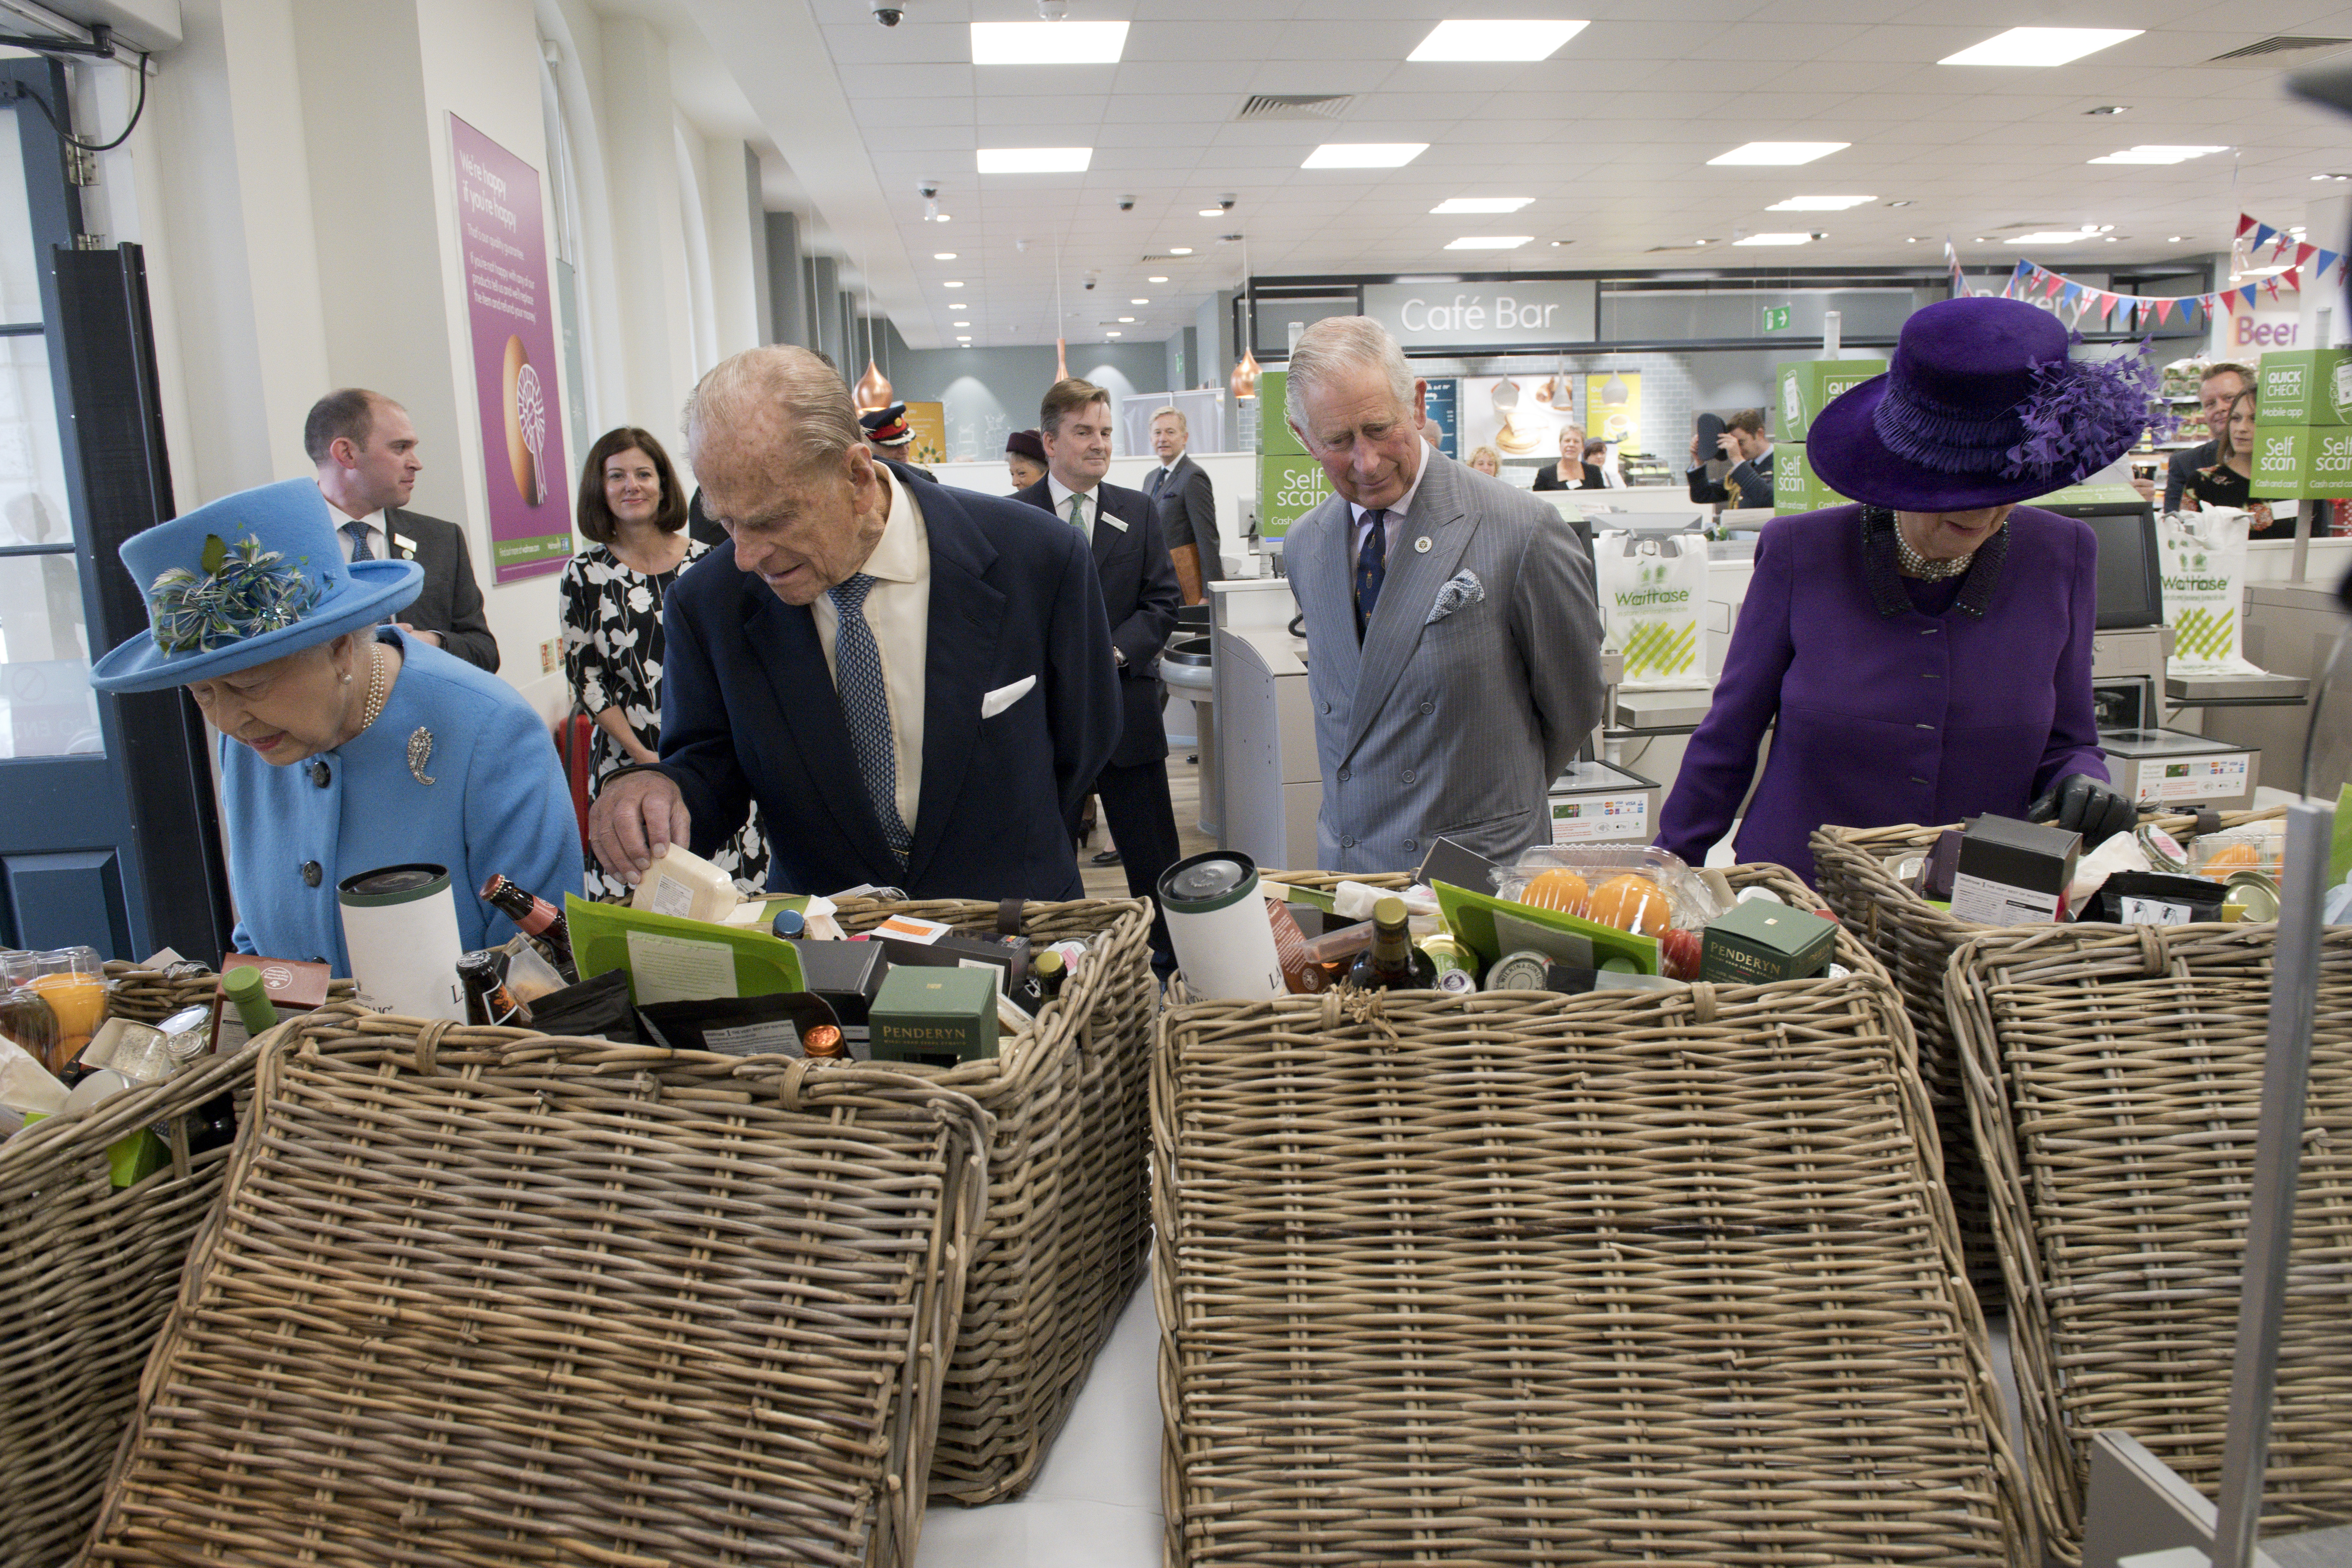 Королева Єлизавета II в супермаркеті